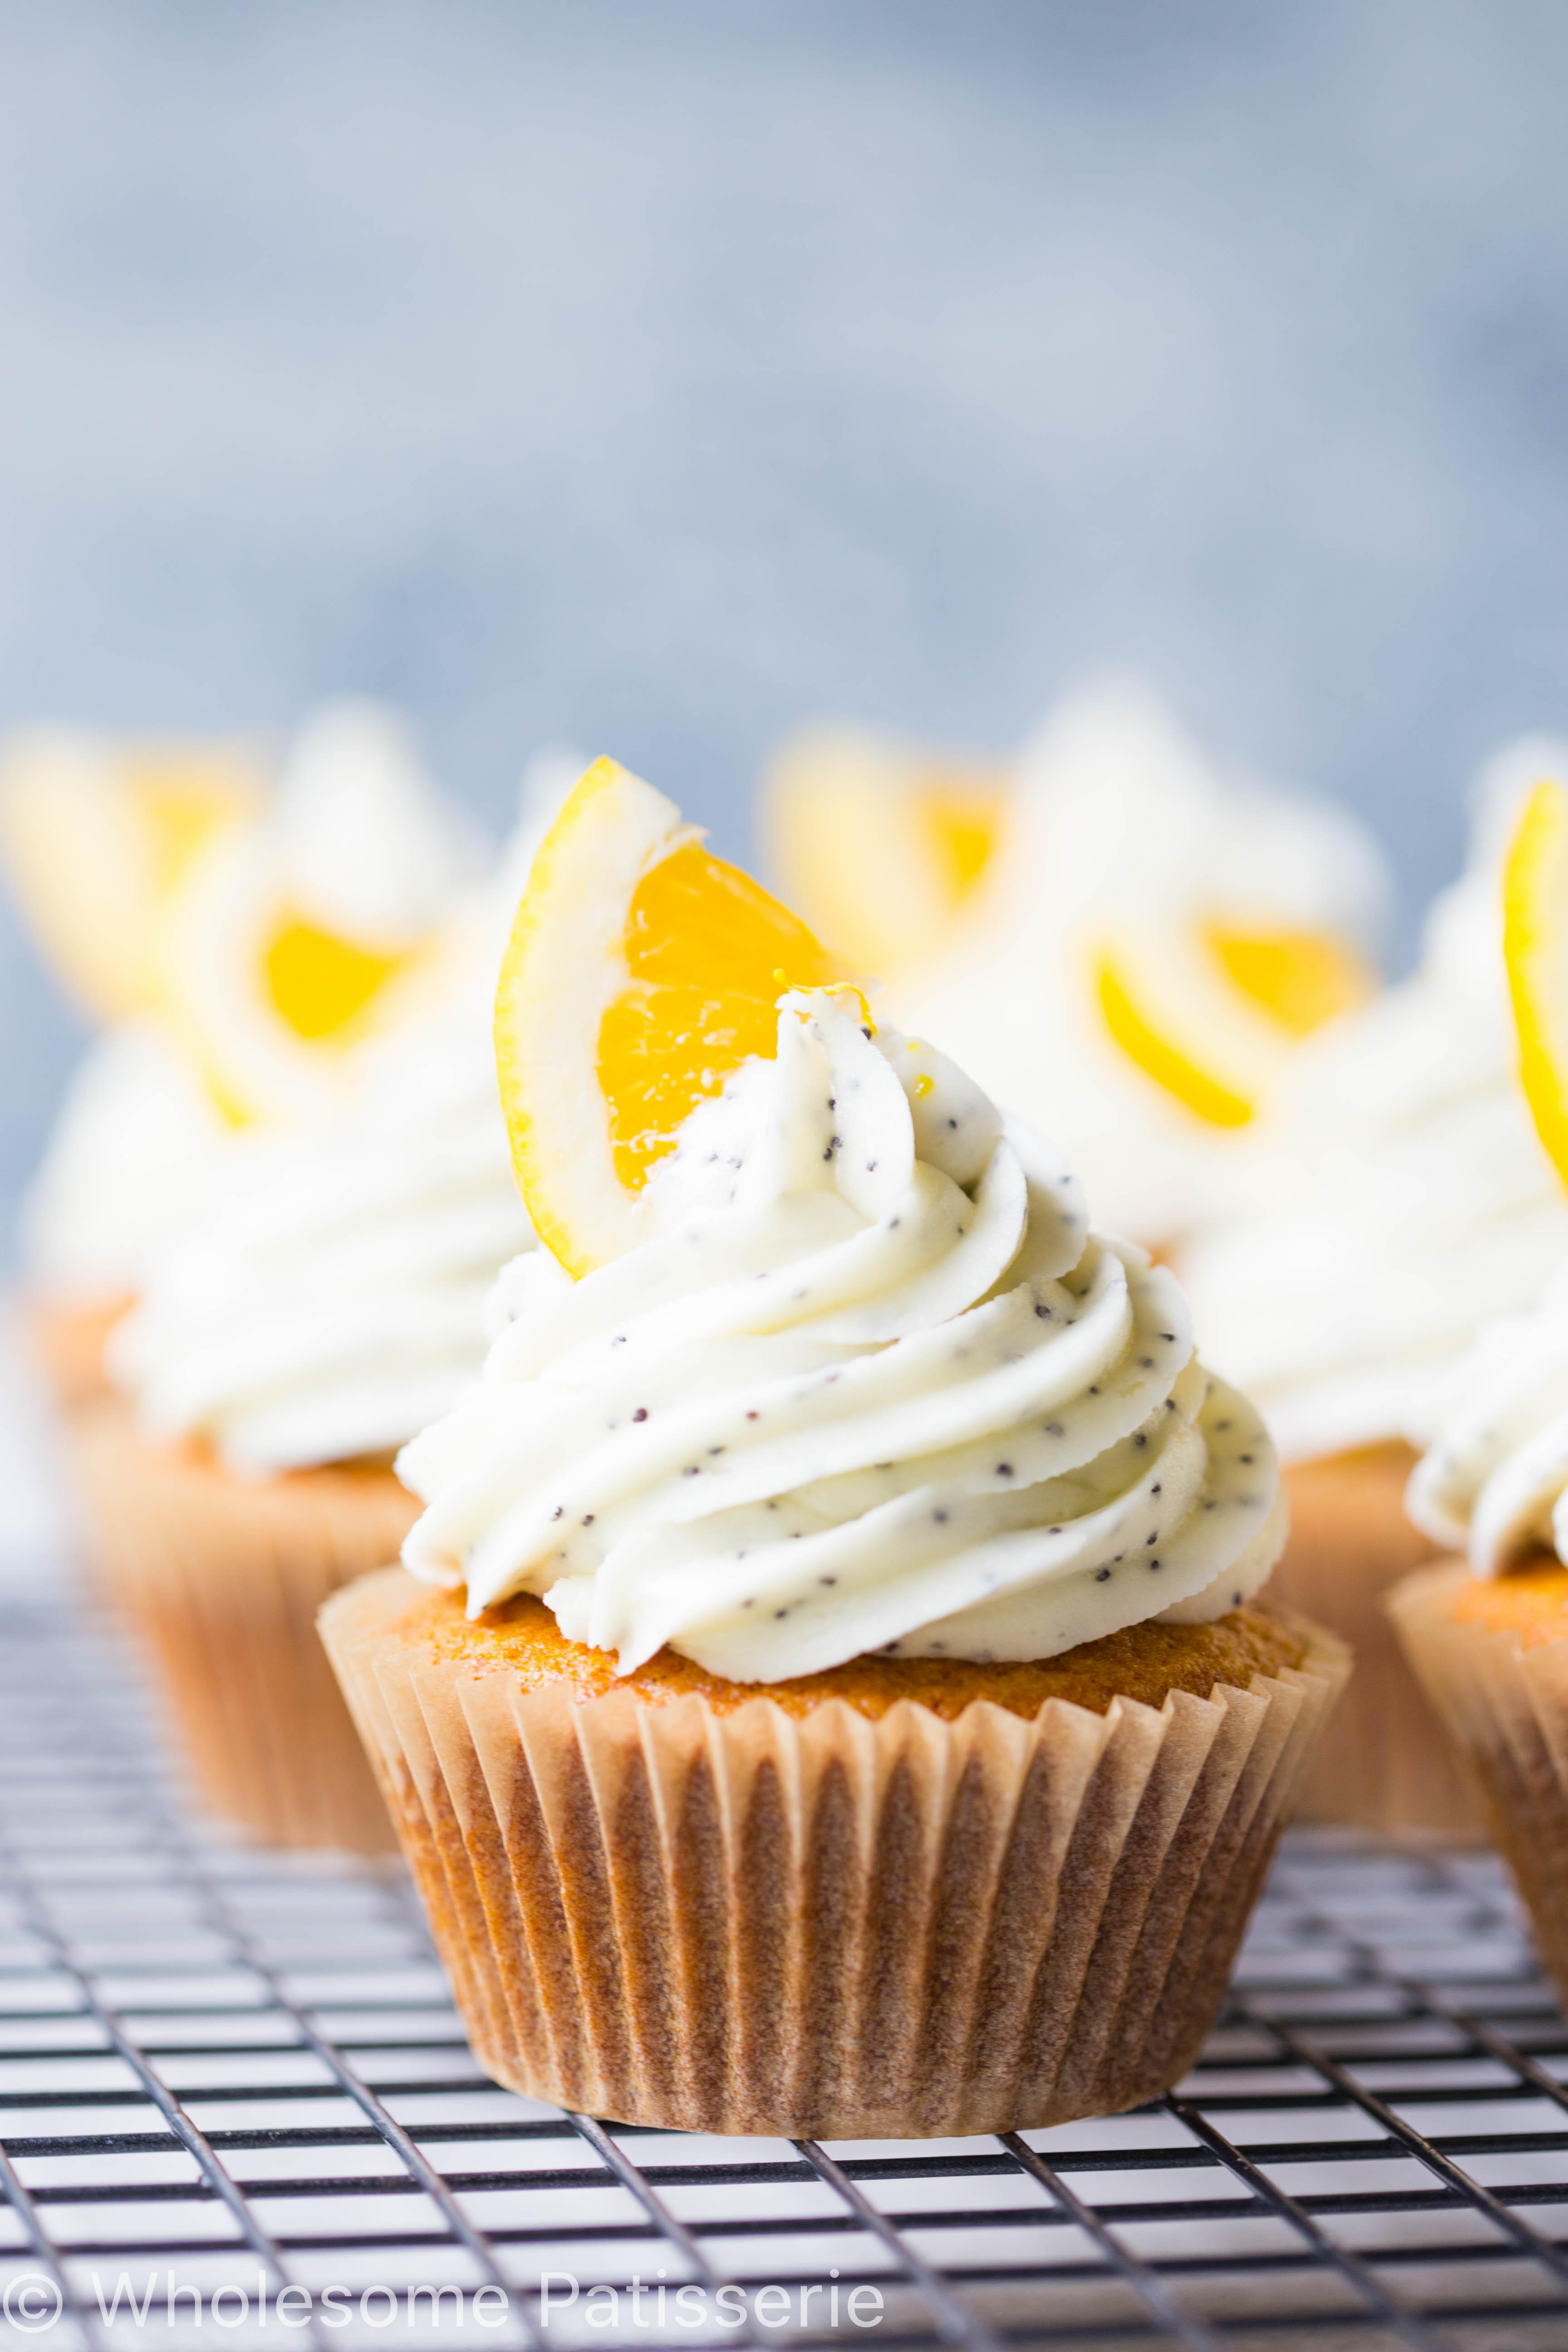 gluten-free-lemon-poppyseed-cupcakes-amazing-vanilla-butter-cupcake-lemon-curd-cupcake-vanilla-cupcake-recipe